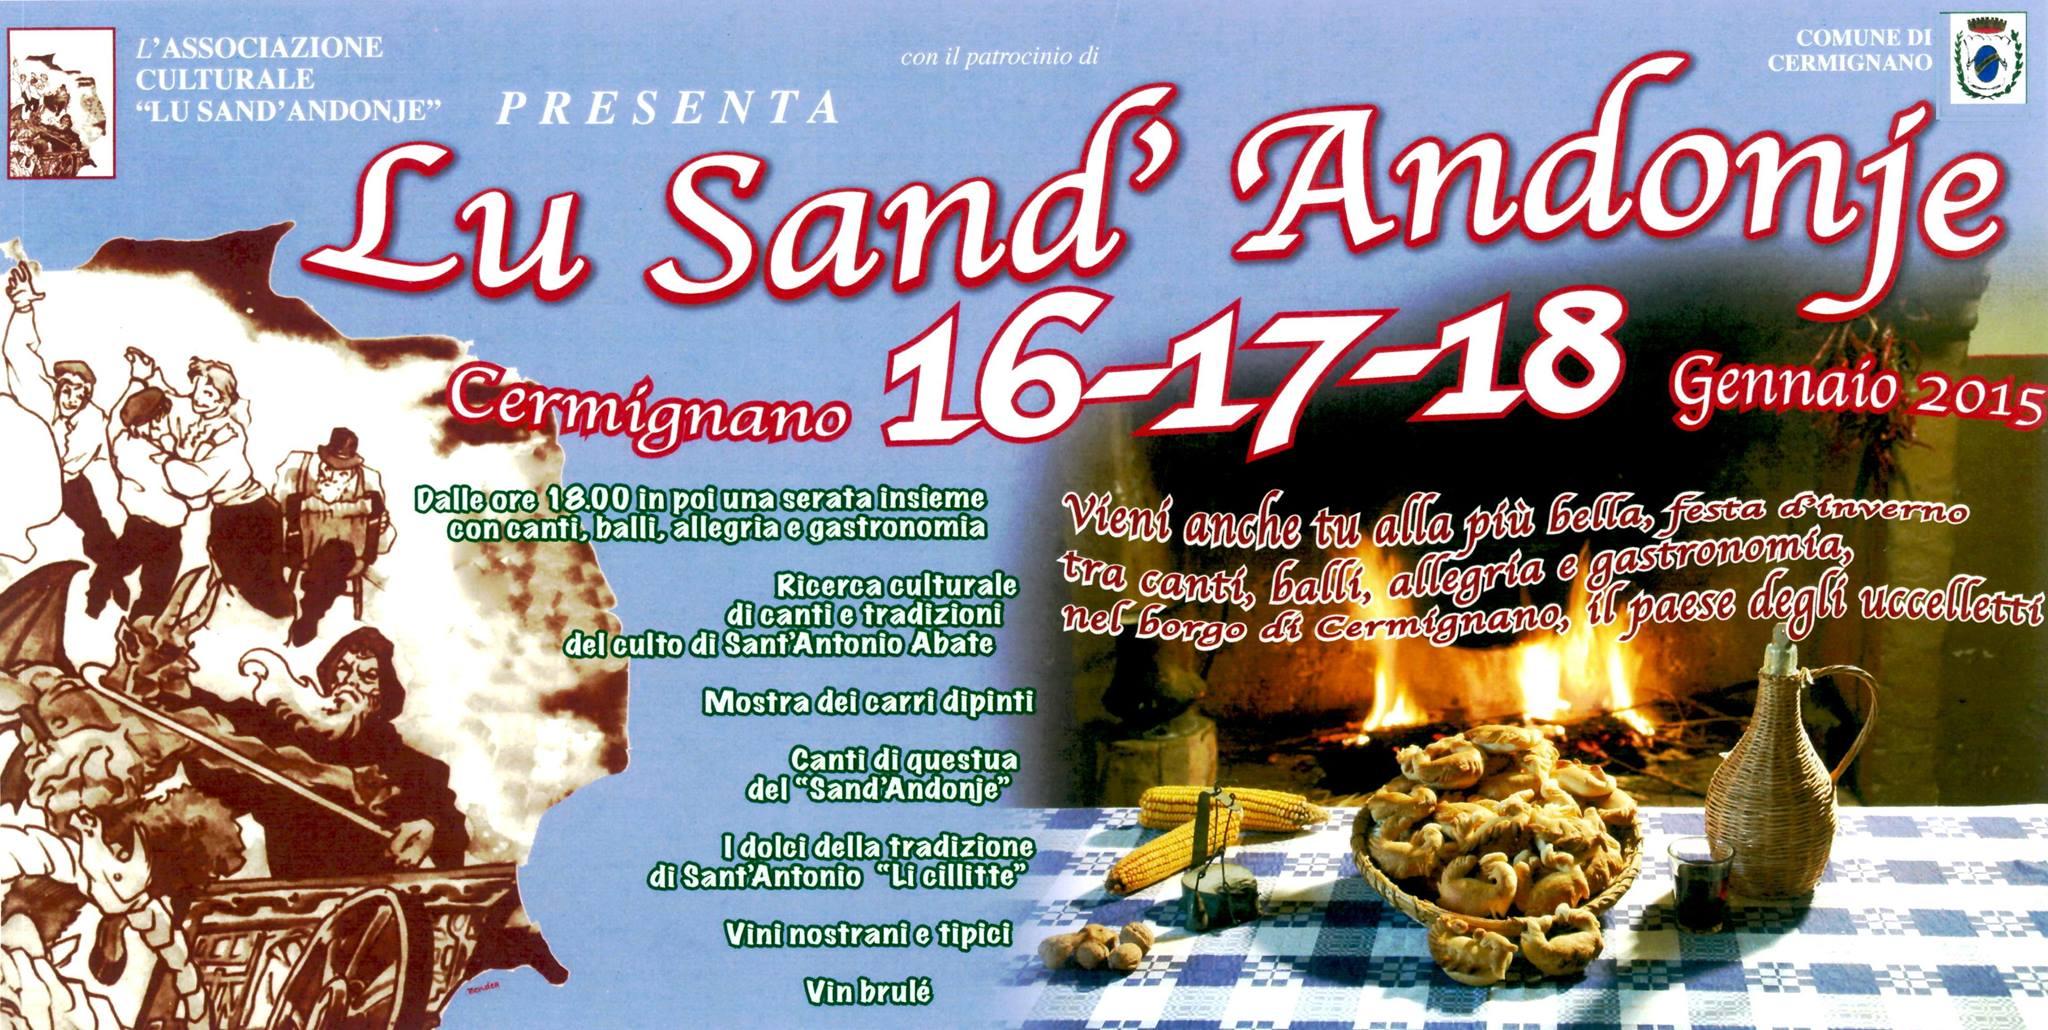 Lu Sand' Andonje a Cermignano